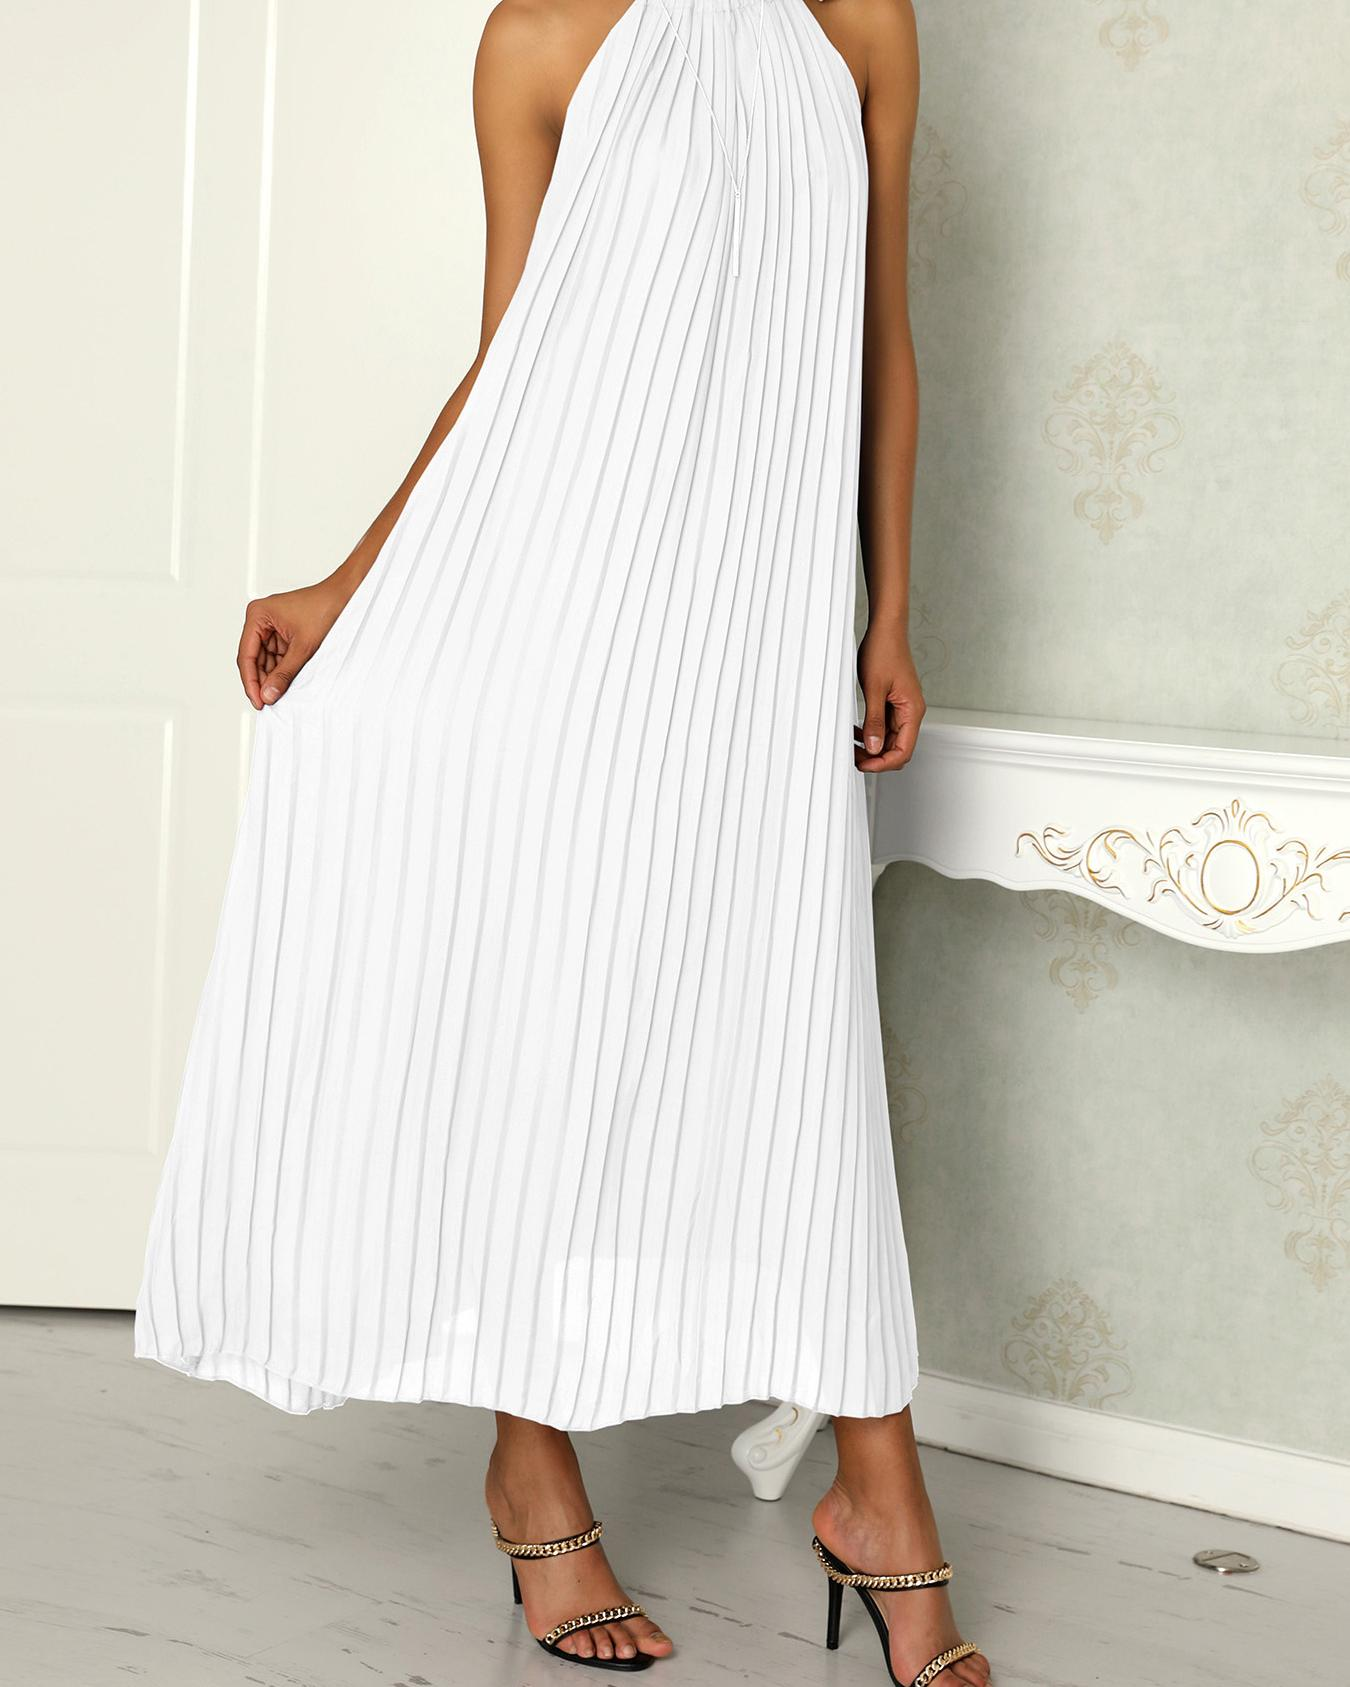 Hot Summer Halter Pleated Casual Maxi Dress